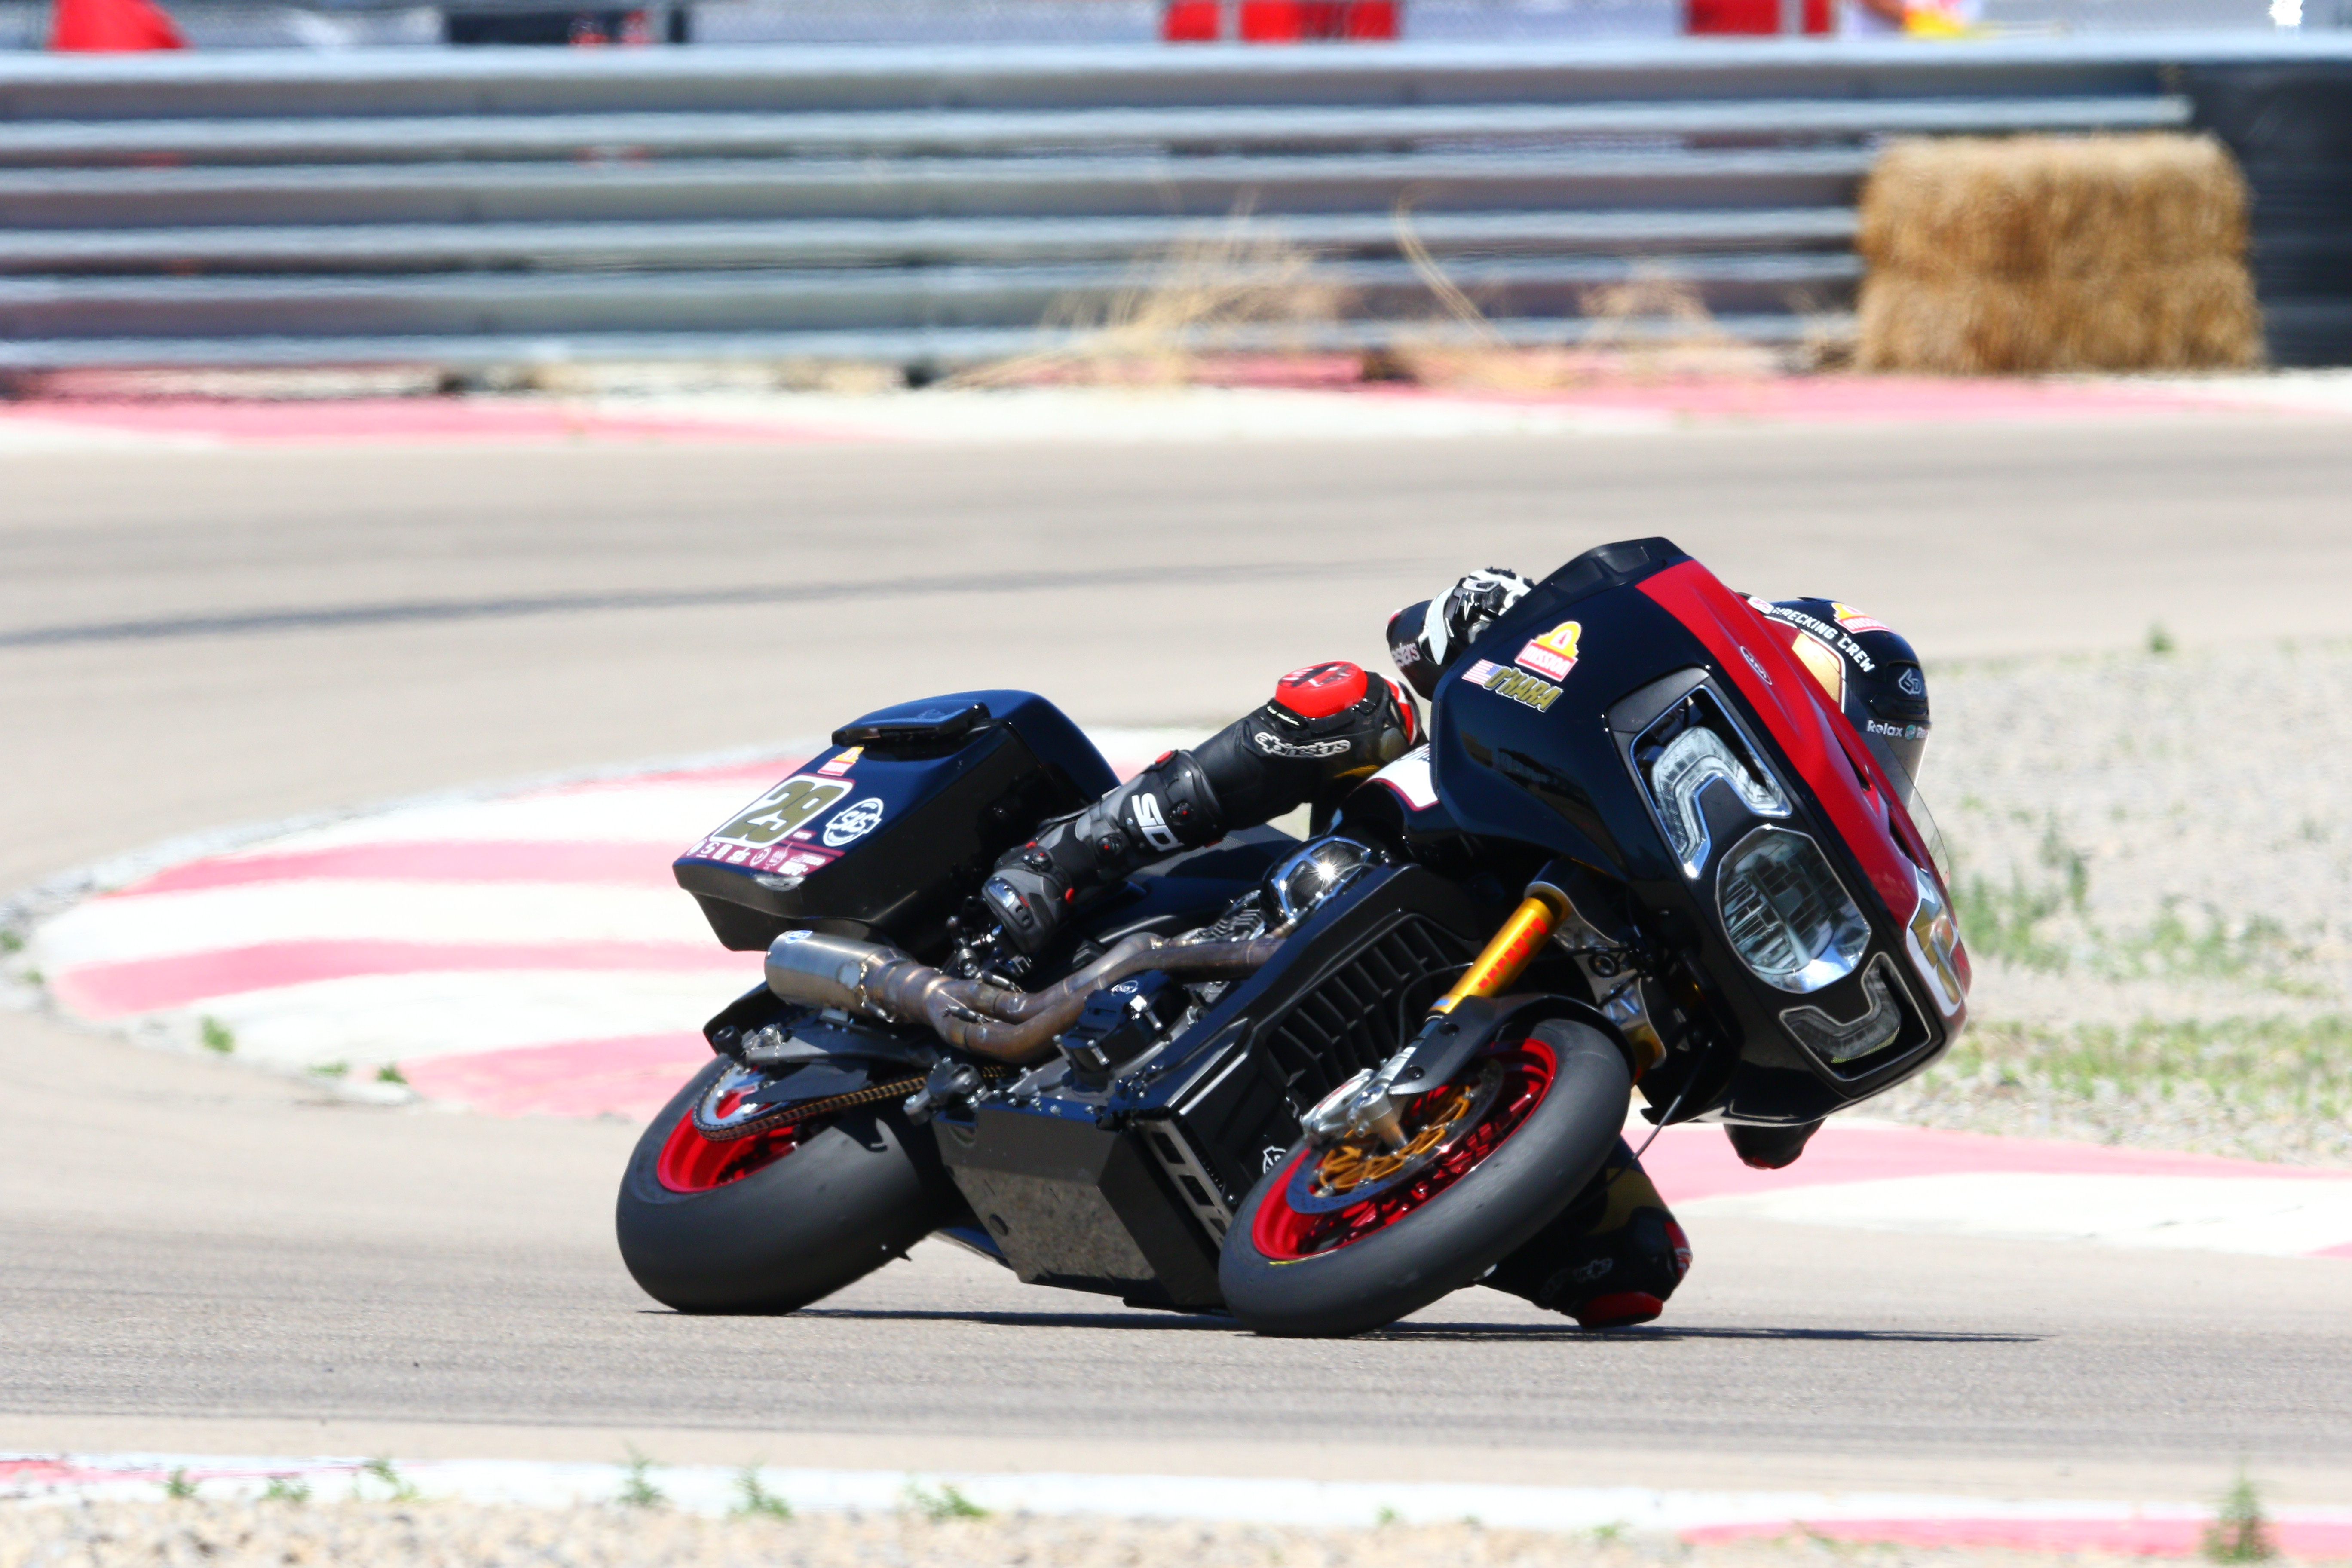 Jun-27-2021-BRL (Sun)-Bagger GP-Race-UMC_2935_Jun2721_228PM_CaliPhoto